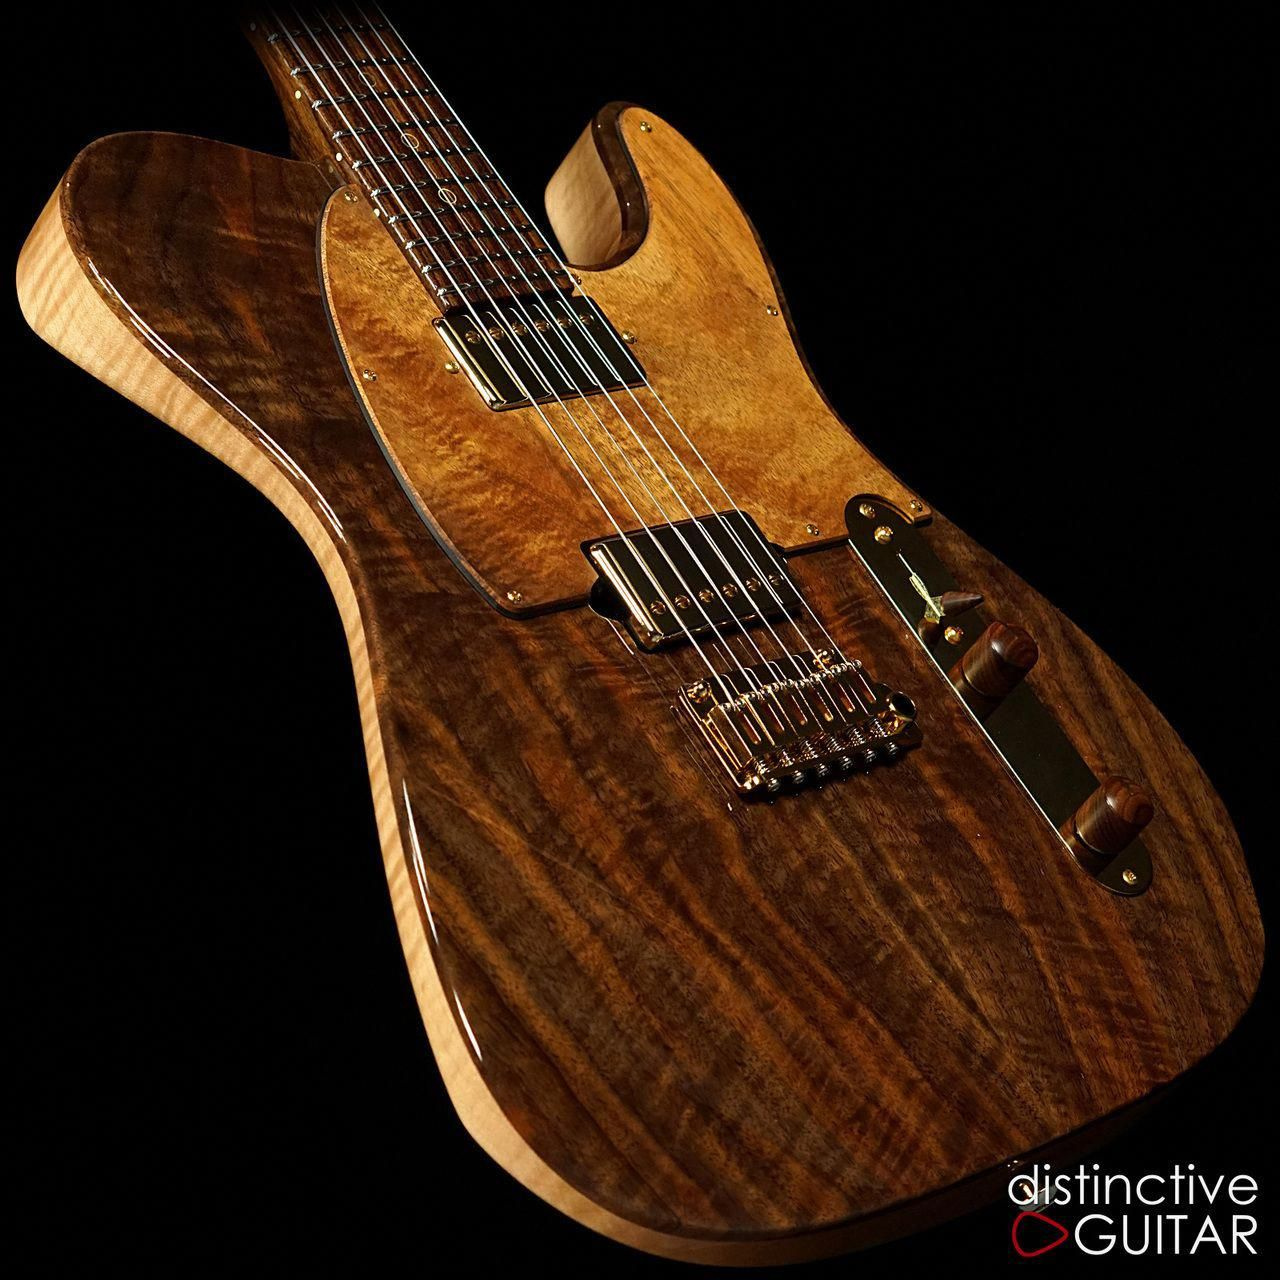 25 Top Travel Guitar Pickup Travel Guitar Fender Guitarras Guitars Travelguitar Ovation Guitar Suhr Guitar